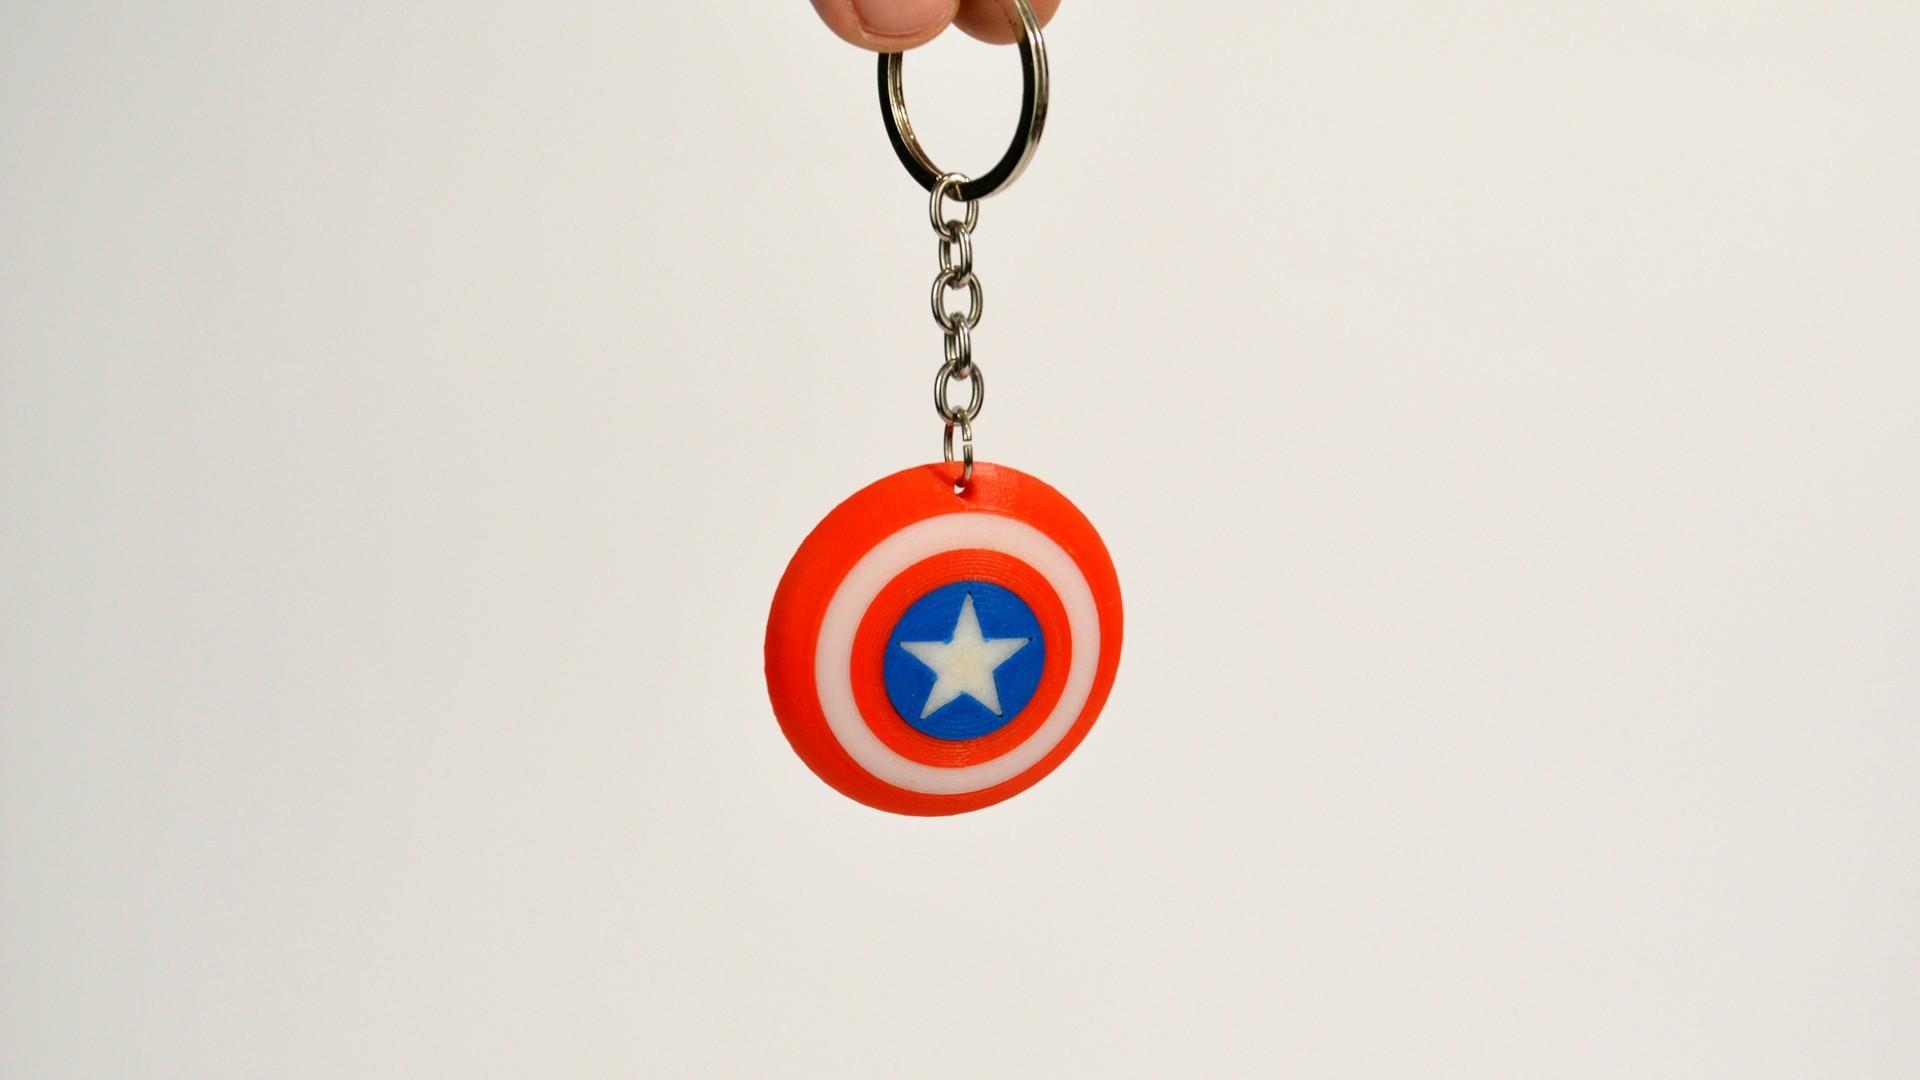 c_america.jpg Download free STL file Captain America Shield Keychain • 3D printable model, 2be3d